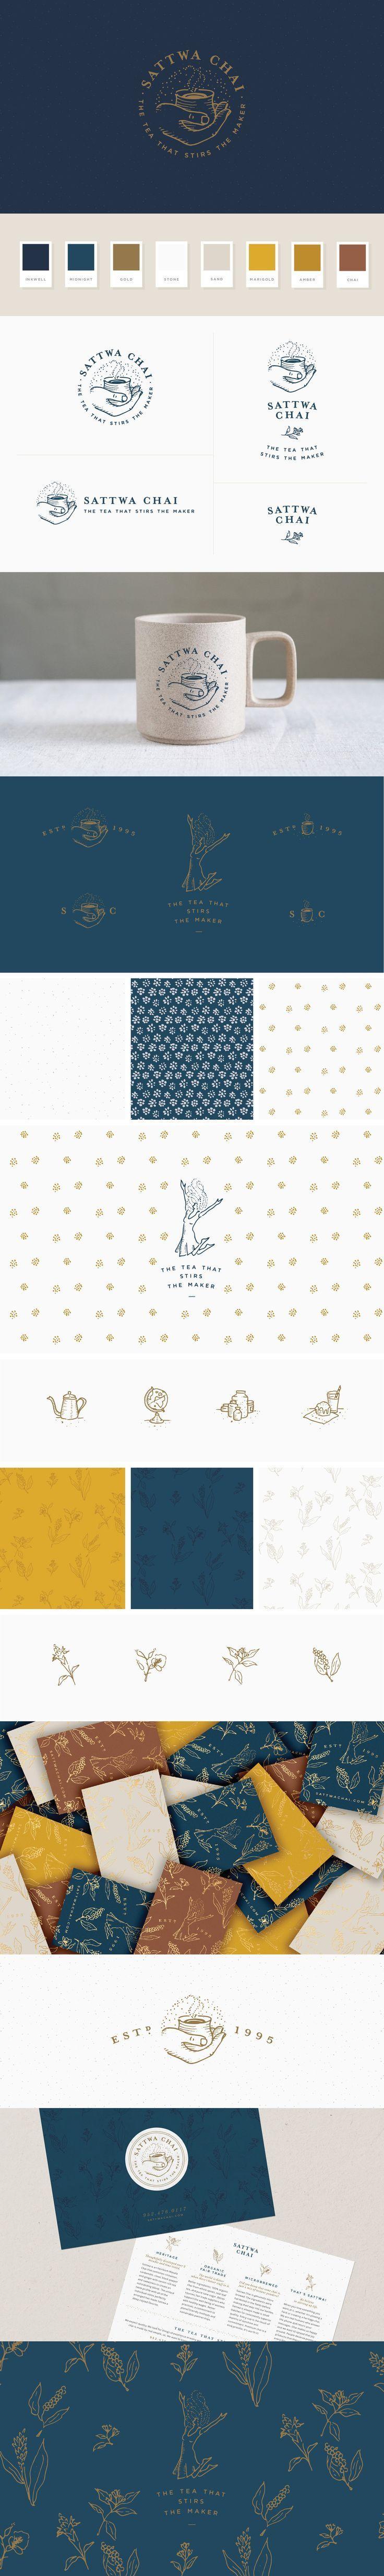 Sattwa Chaitea - logo & brand identity design crafted by Melissa Yeager